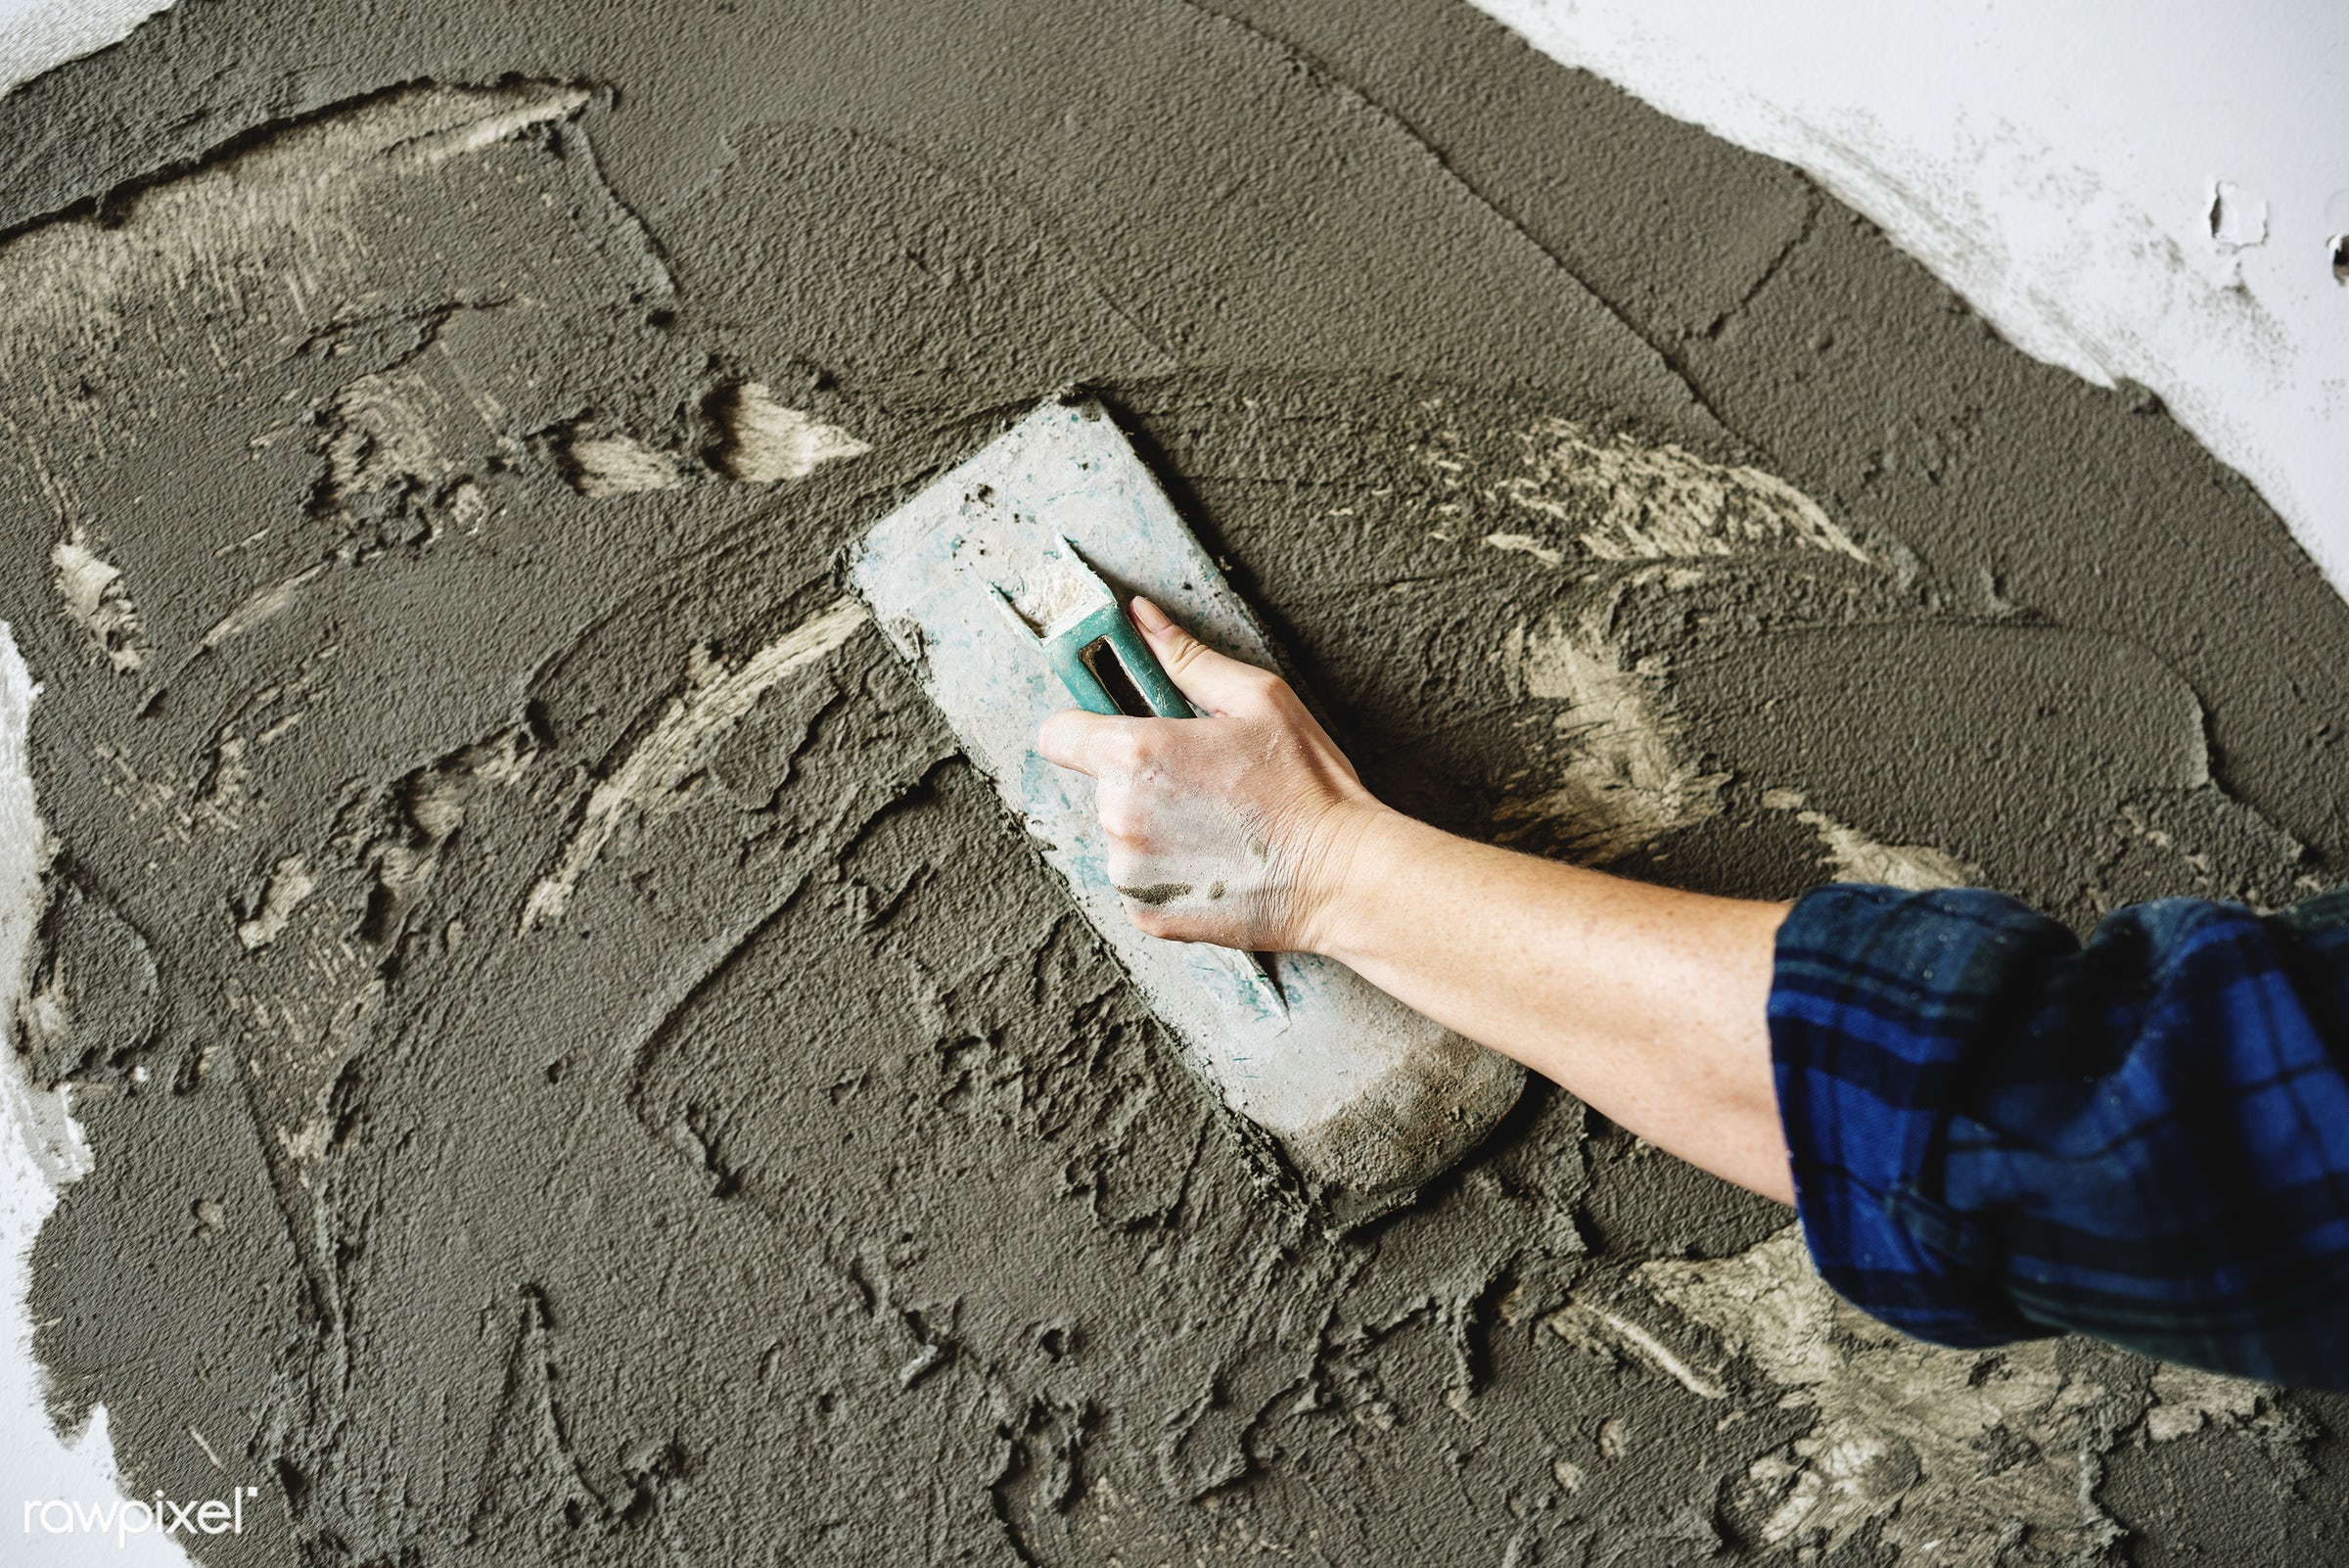 concrete, cement, construction, plaster, plastering, renovation, equipment, grout, indoor, job, man, mason, material, mortar...